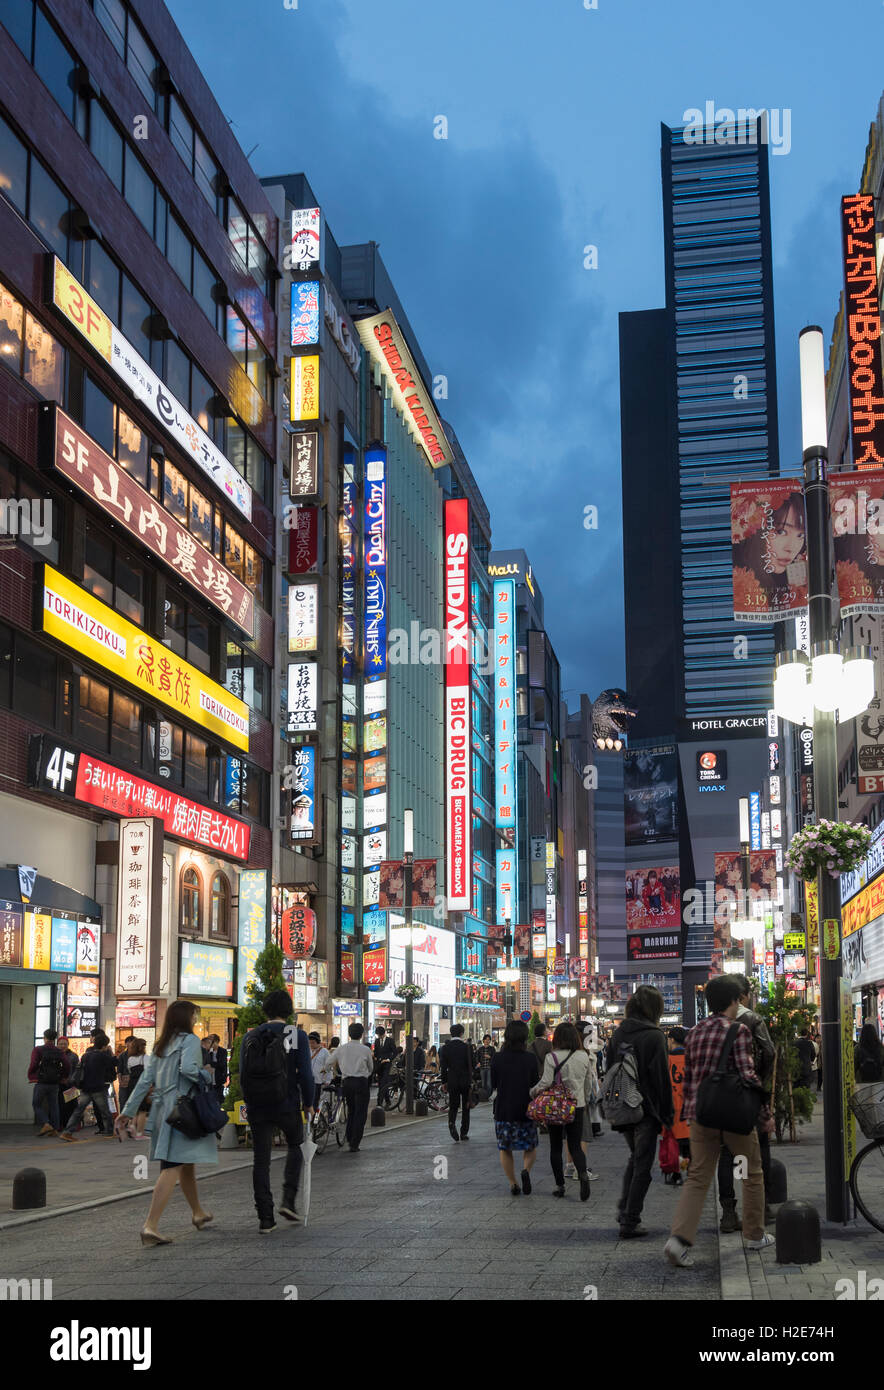 Scena di strada di Kabukicho, Shinjuku, Tokyo, Giappone Immagini Stock